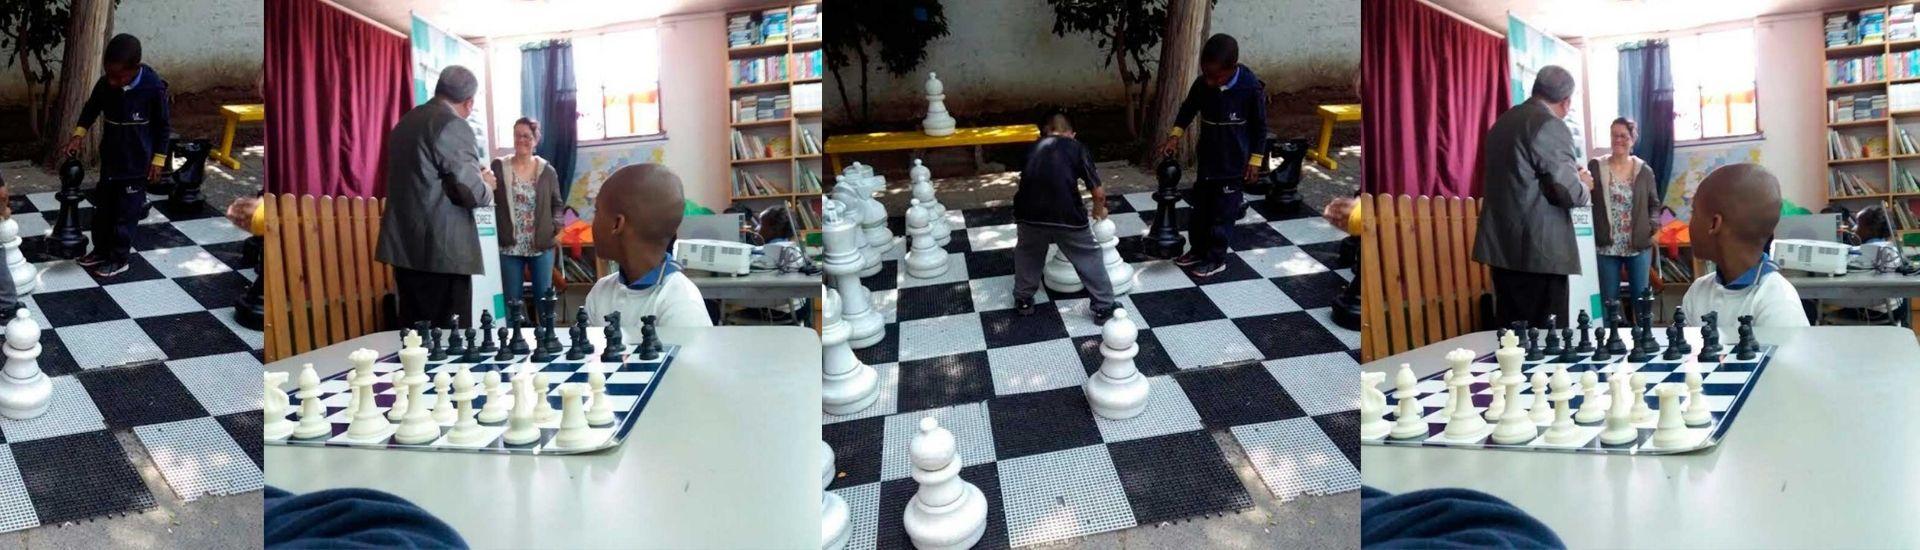 Foto jugando ajedrez